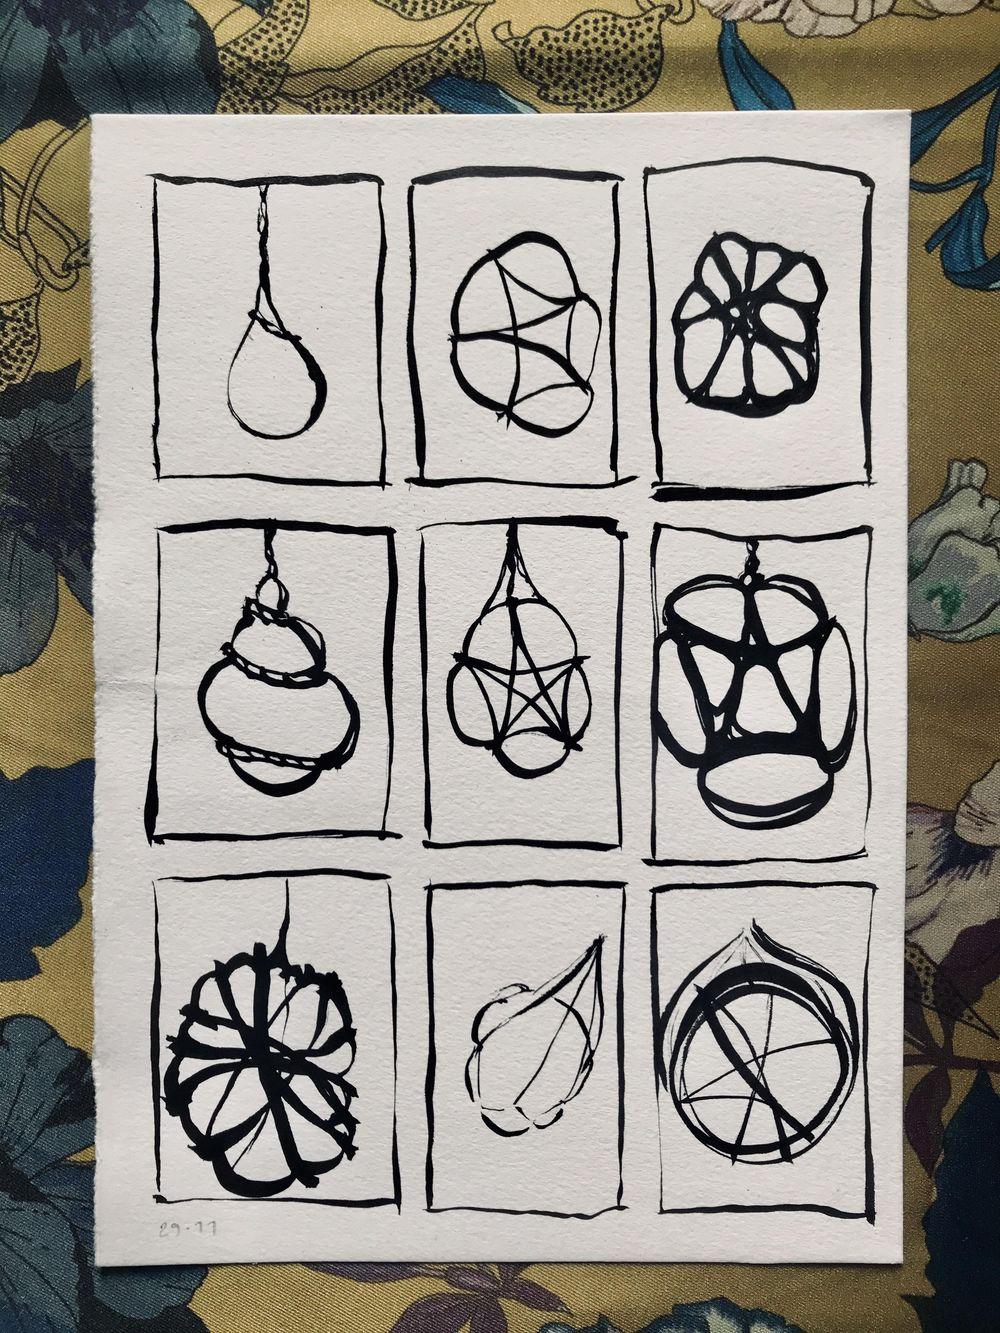 Overcoming artist's block - image 2 - student project